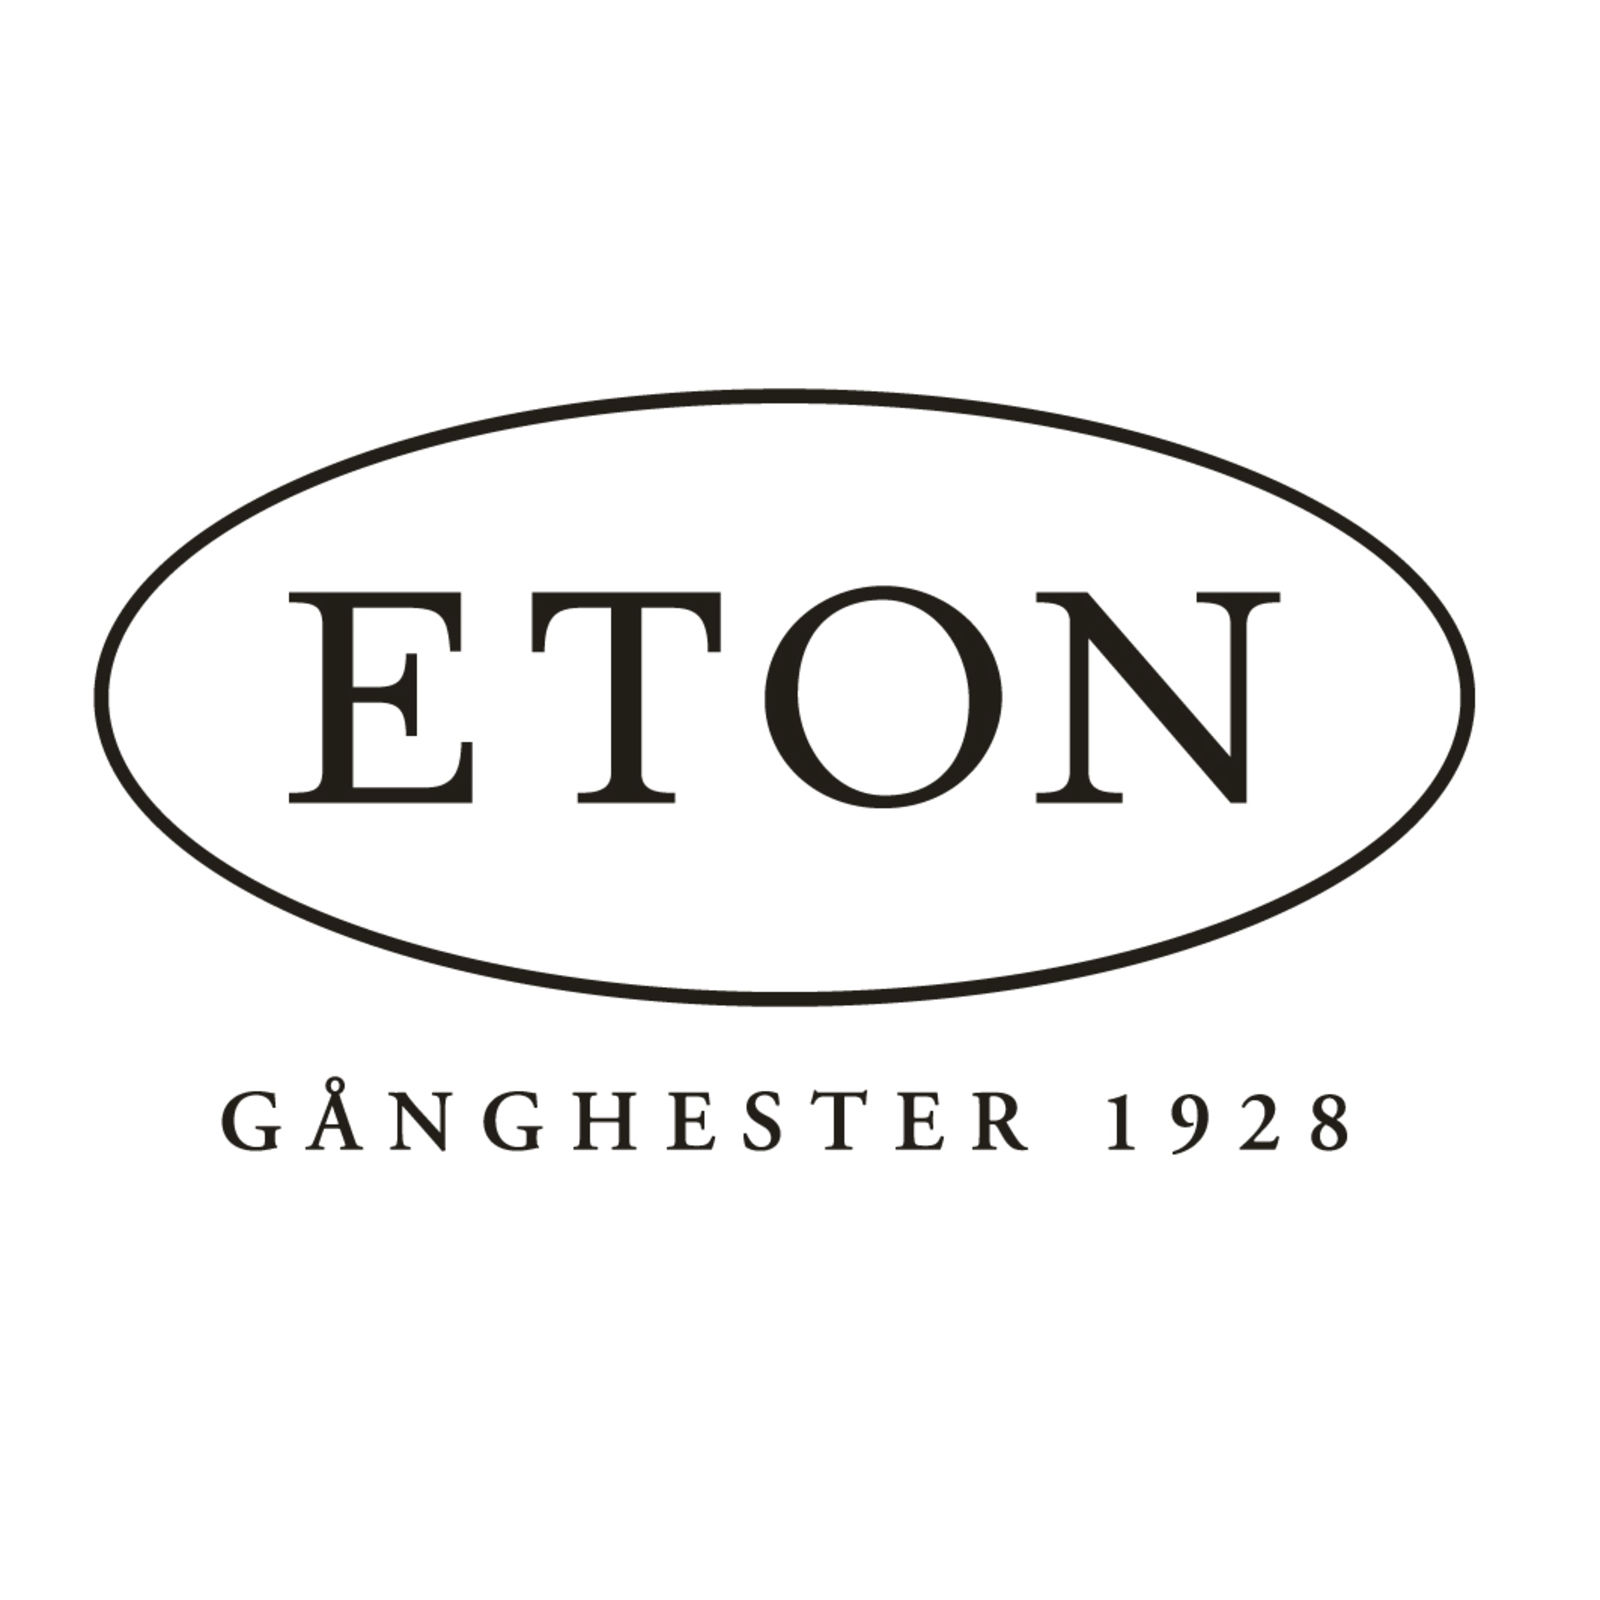 ETON (Bild 1)